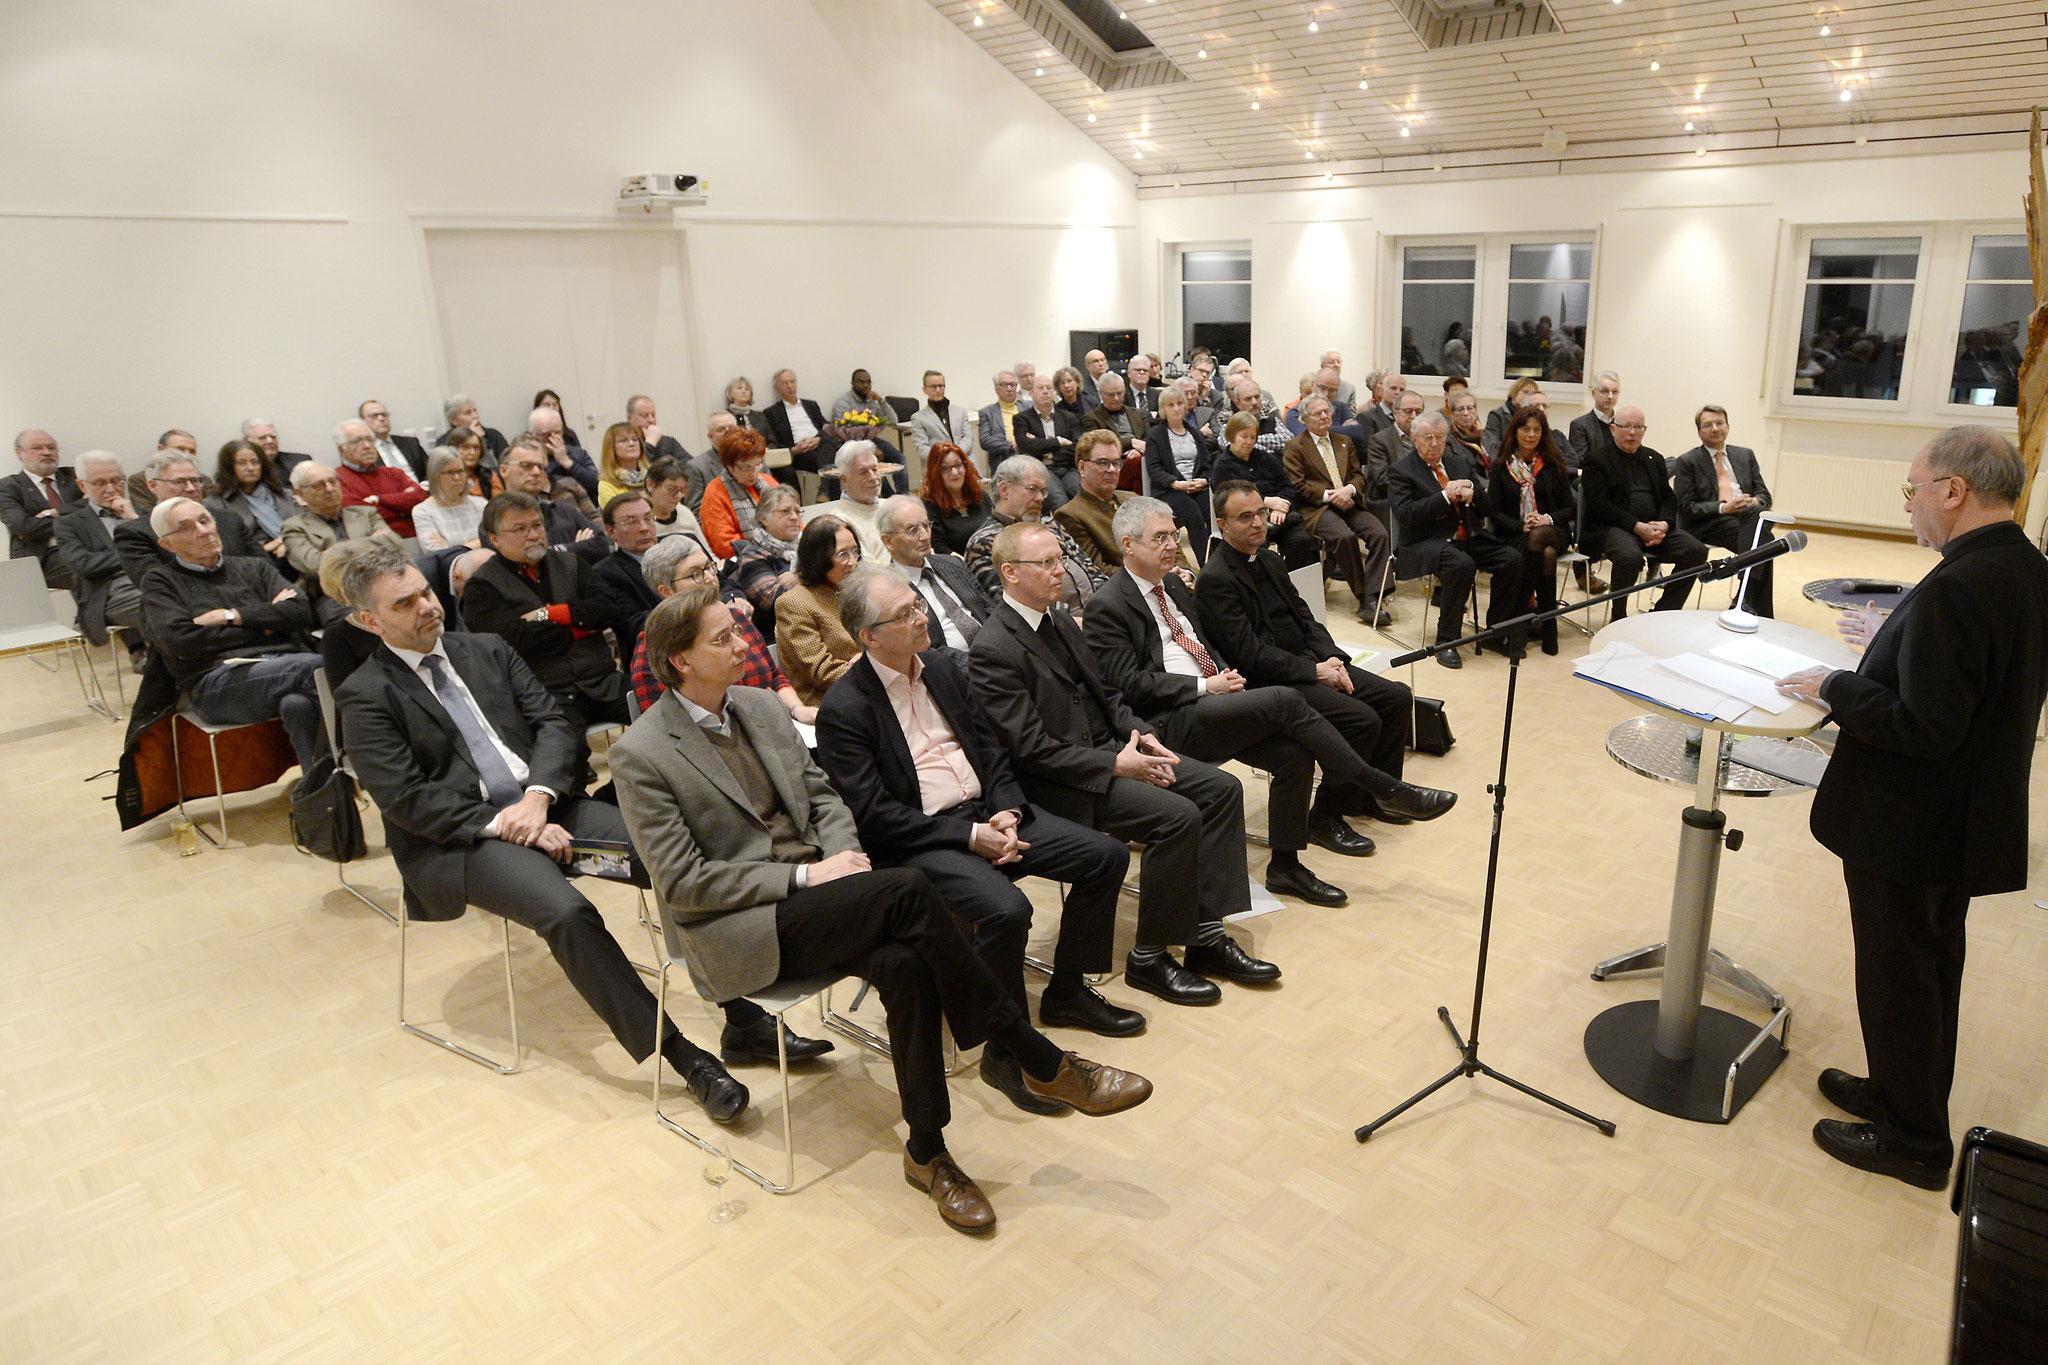 Dem Publikum gefällts. Bild Copyright Helmut G. Roos